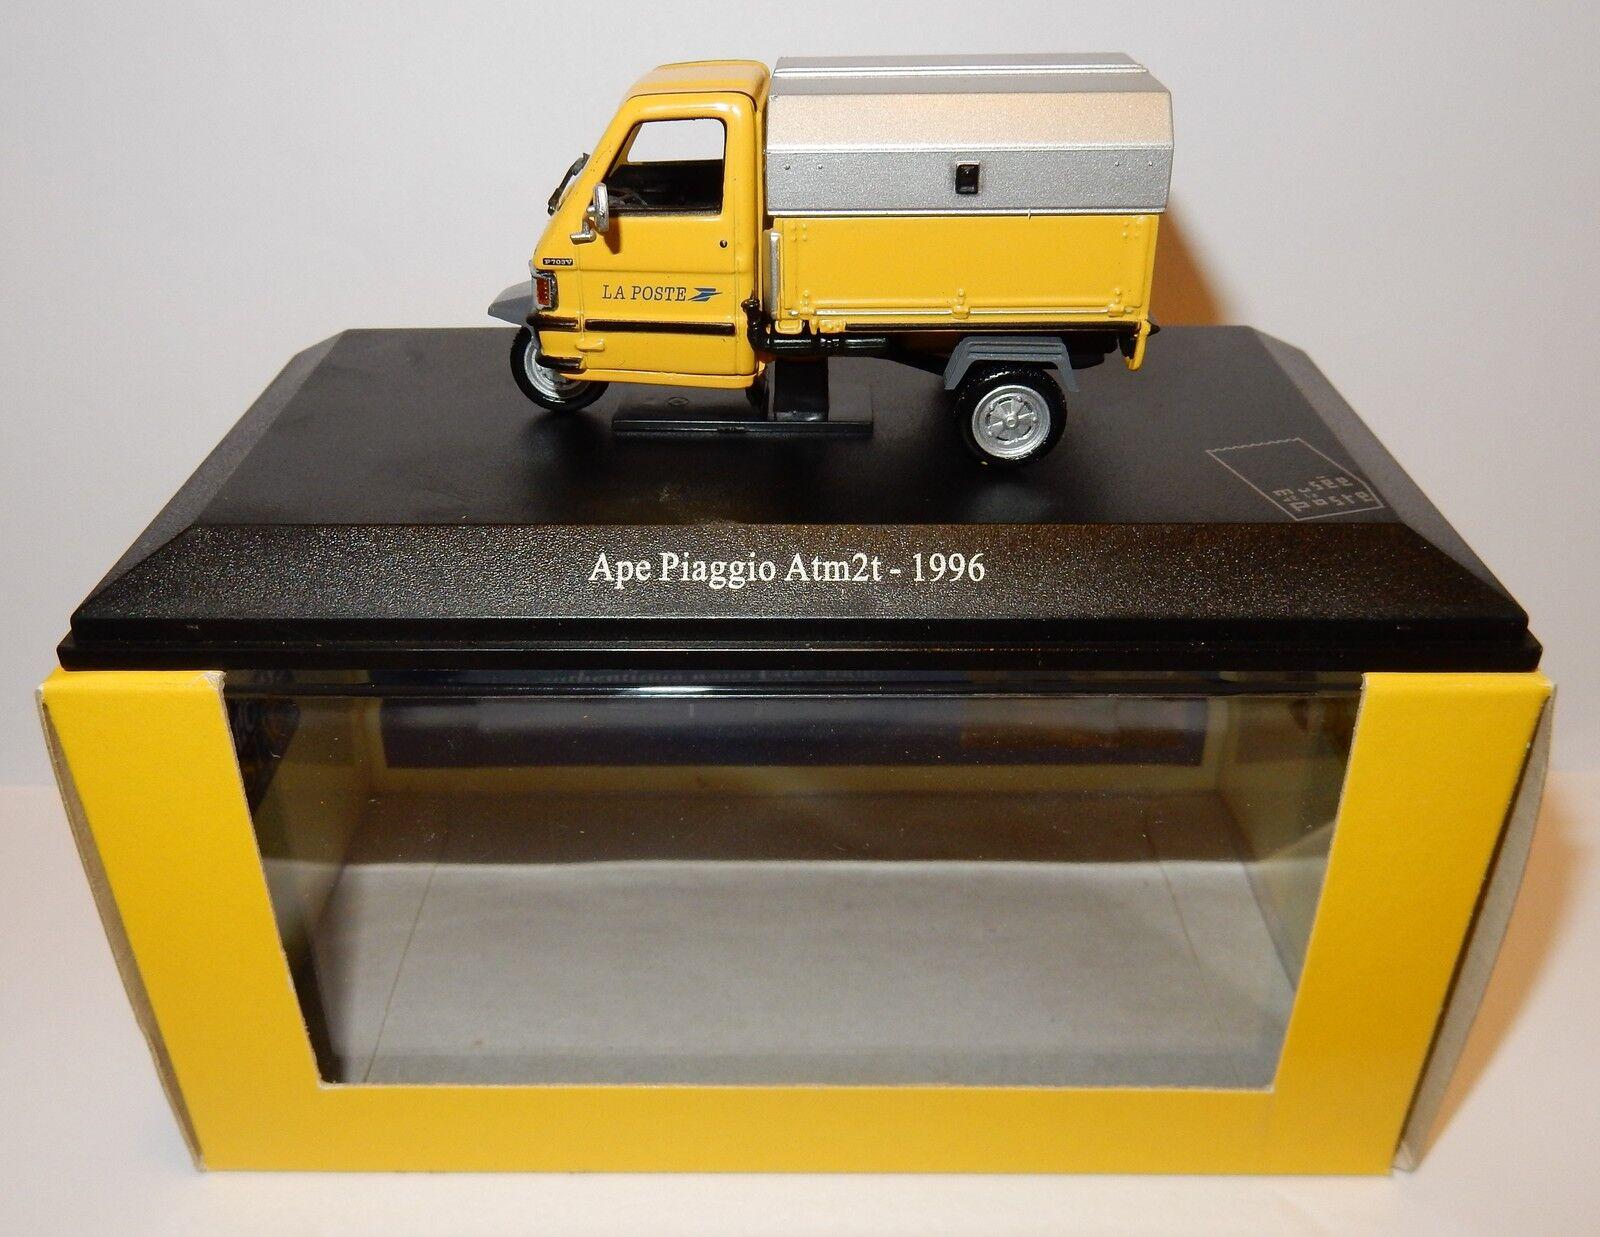 RARA SCOOTER SCOOTER PIAGGIO APE ATM2T 1996 POSTES POSTE PTT 1 43 IN LUSSO BOX